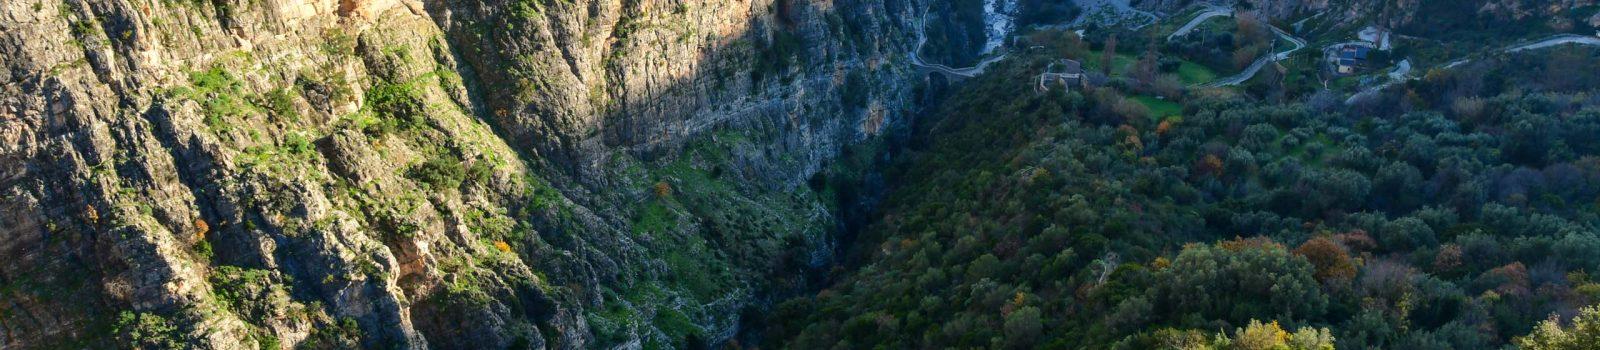 Wandern im Nationalpark Pollino